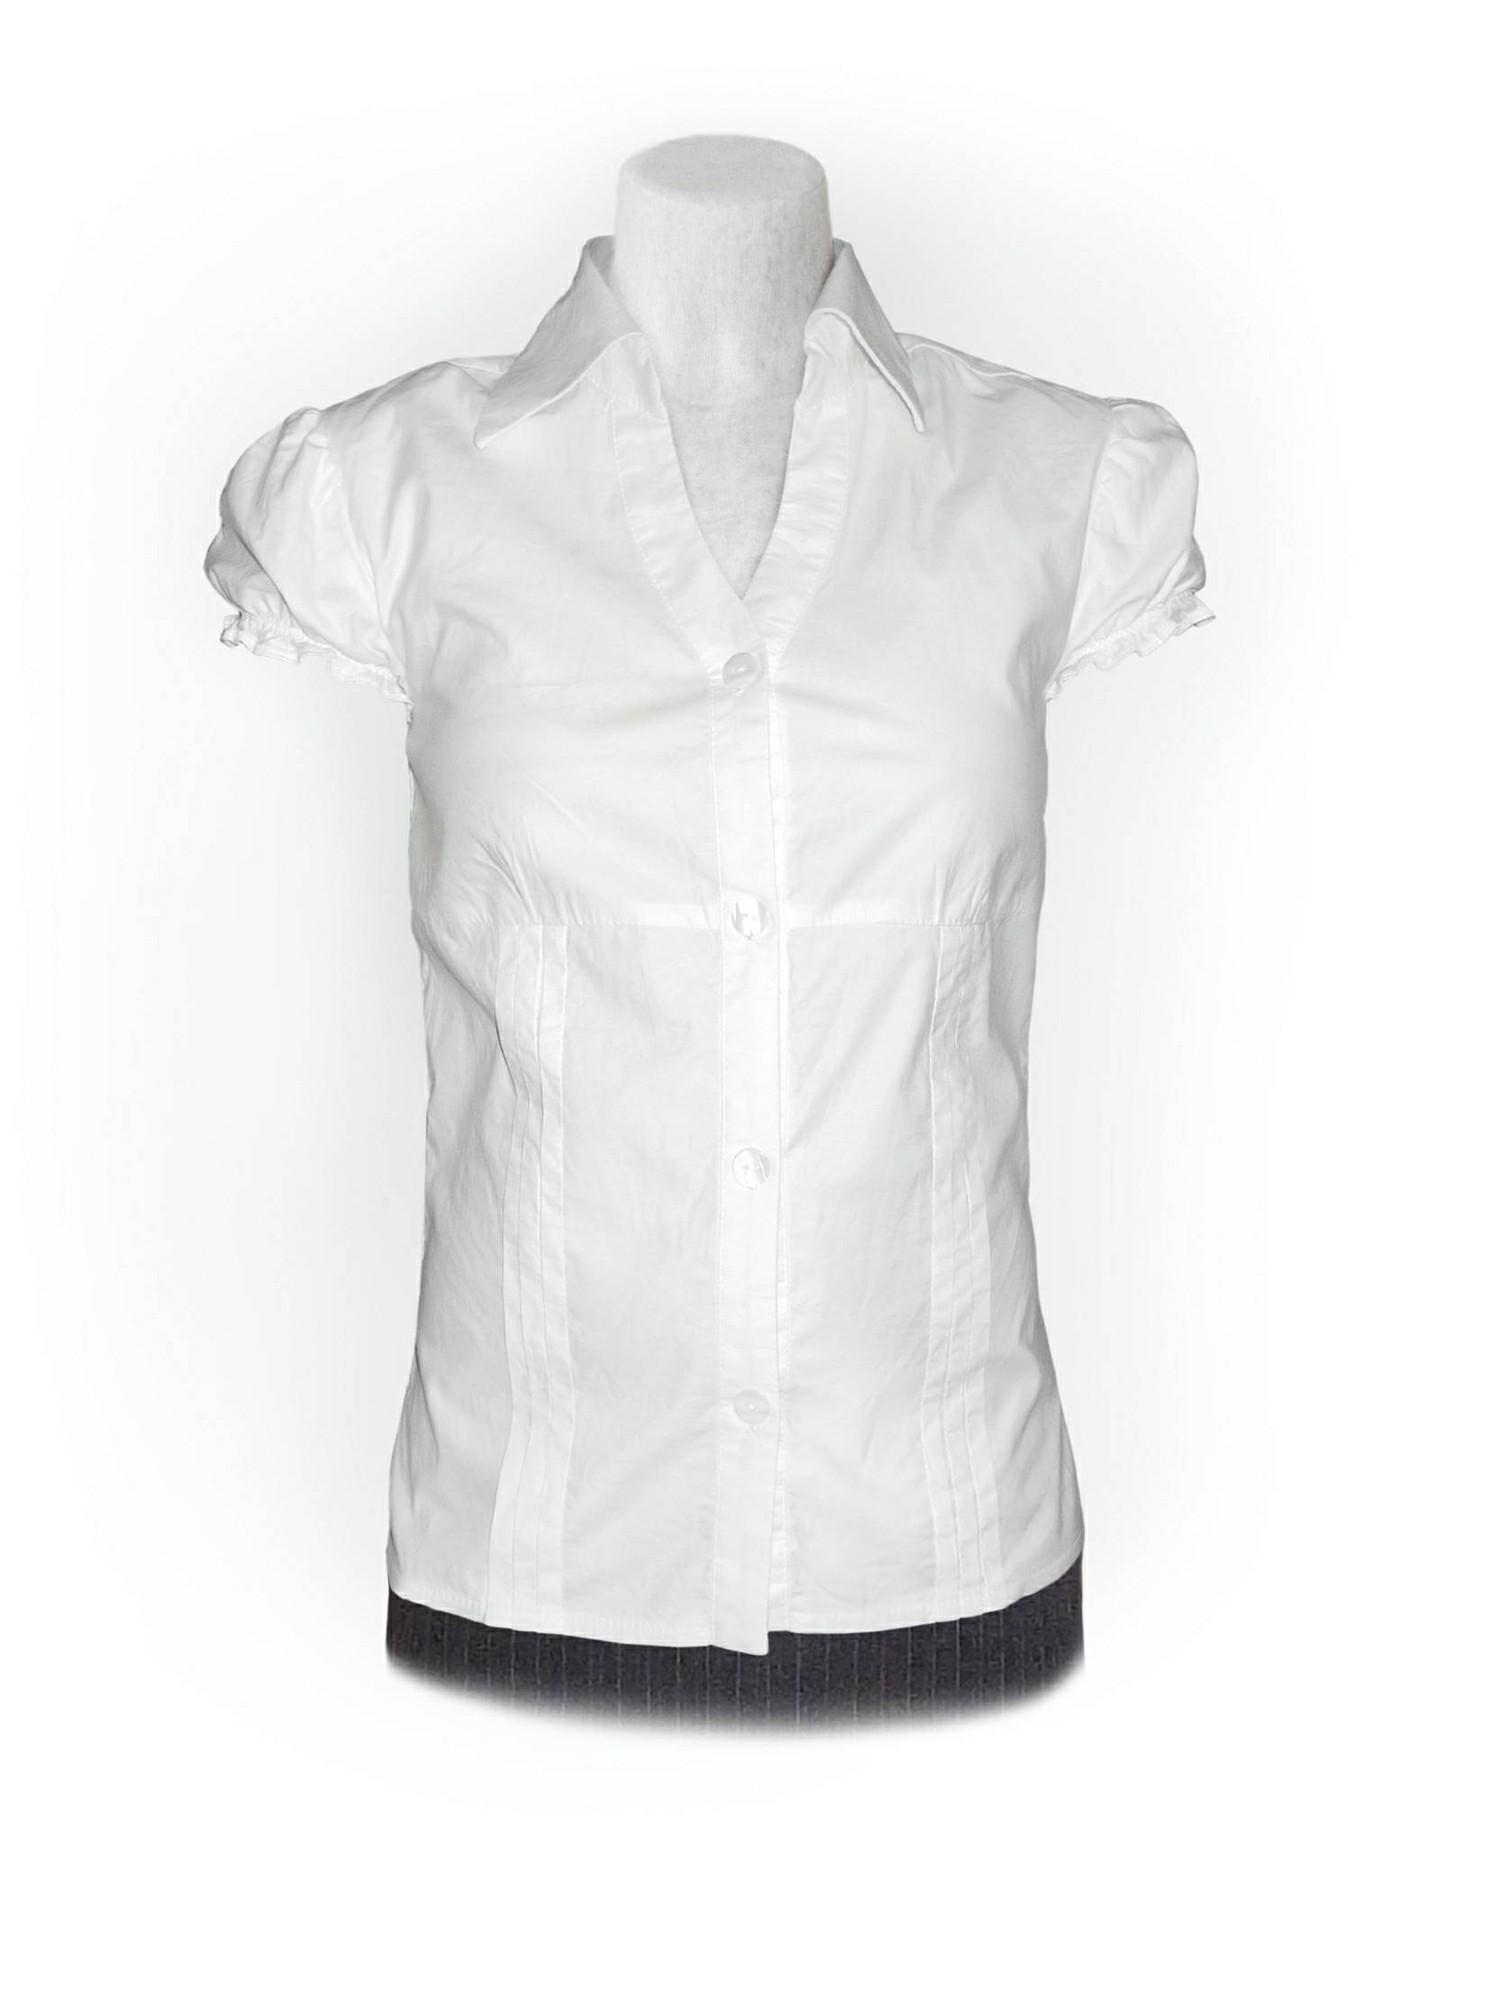 Sewing pattern blouse hot black blouse sewing pattern blouse 74 jeuxipadfo Image collections